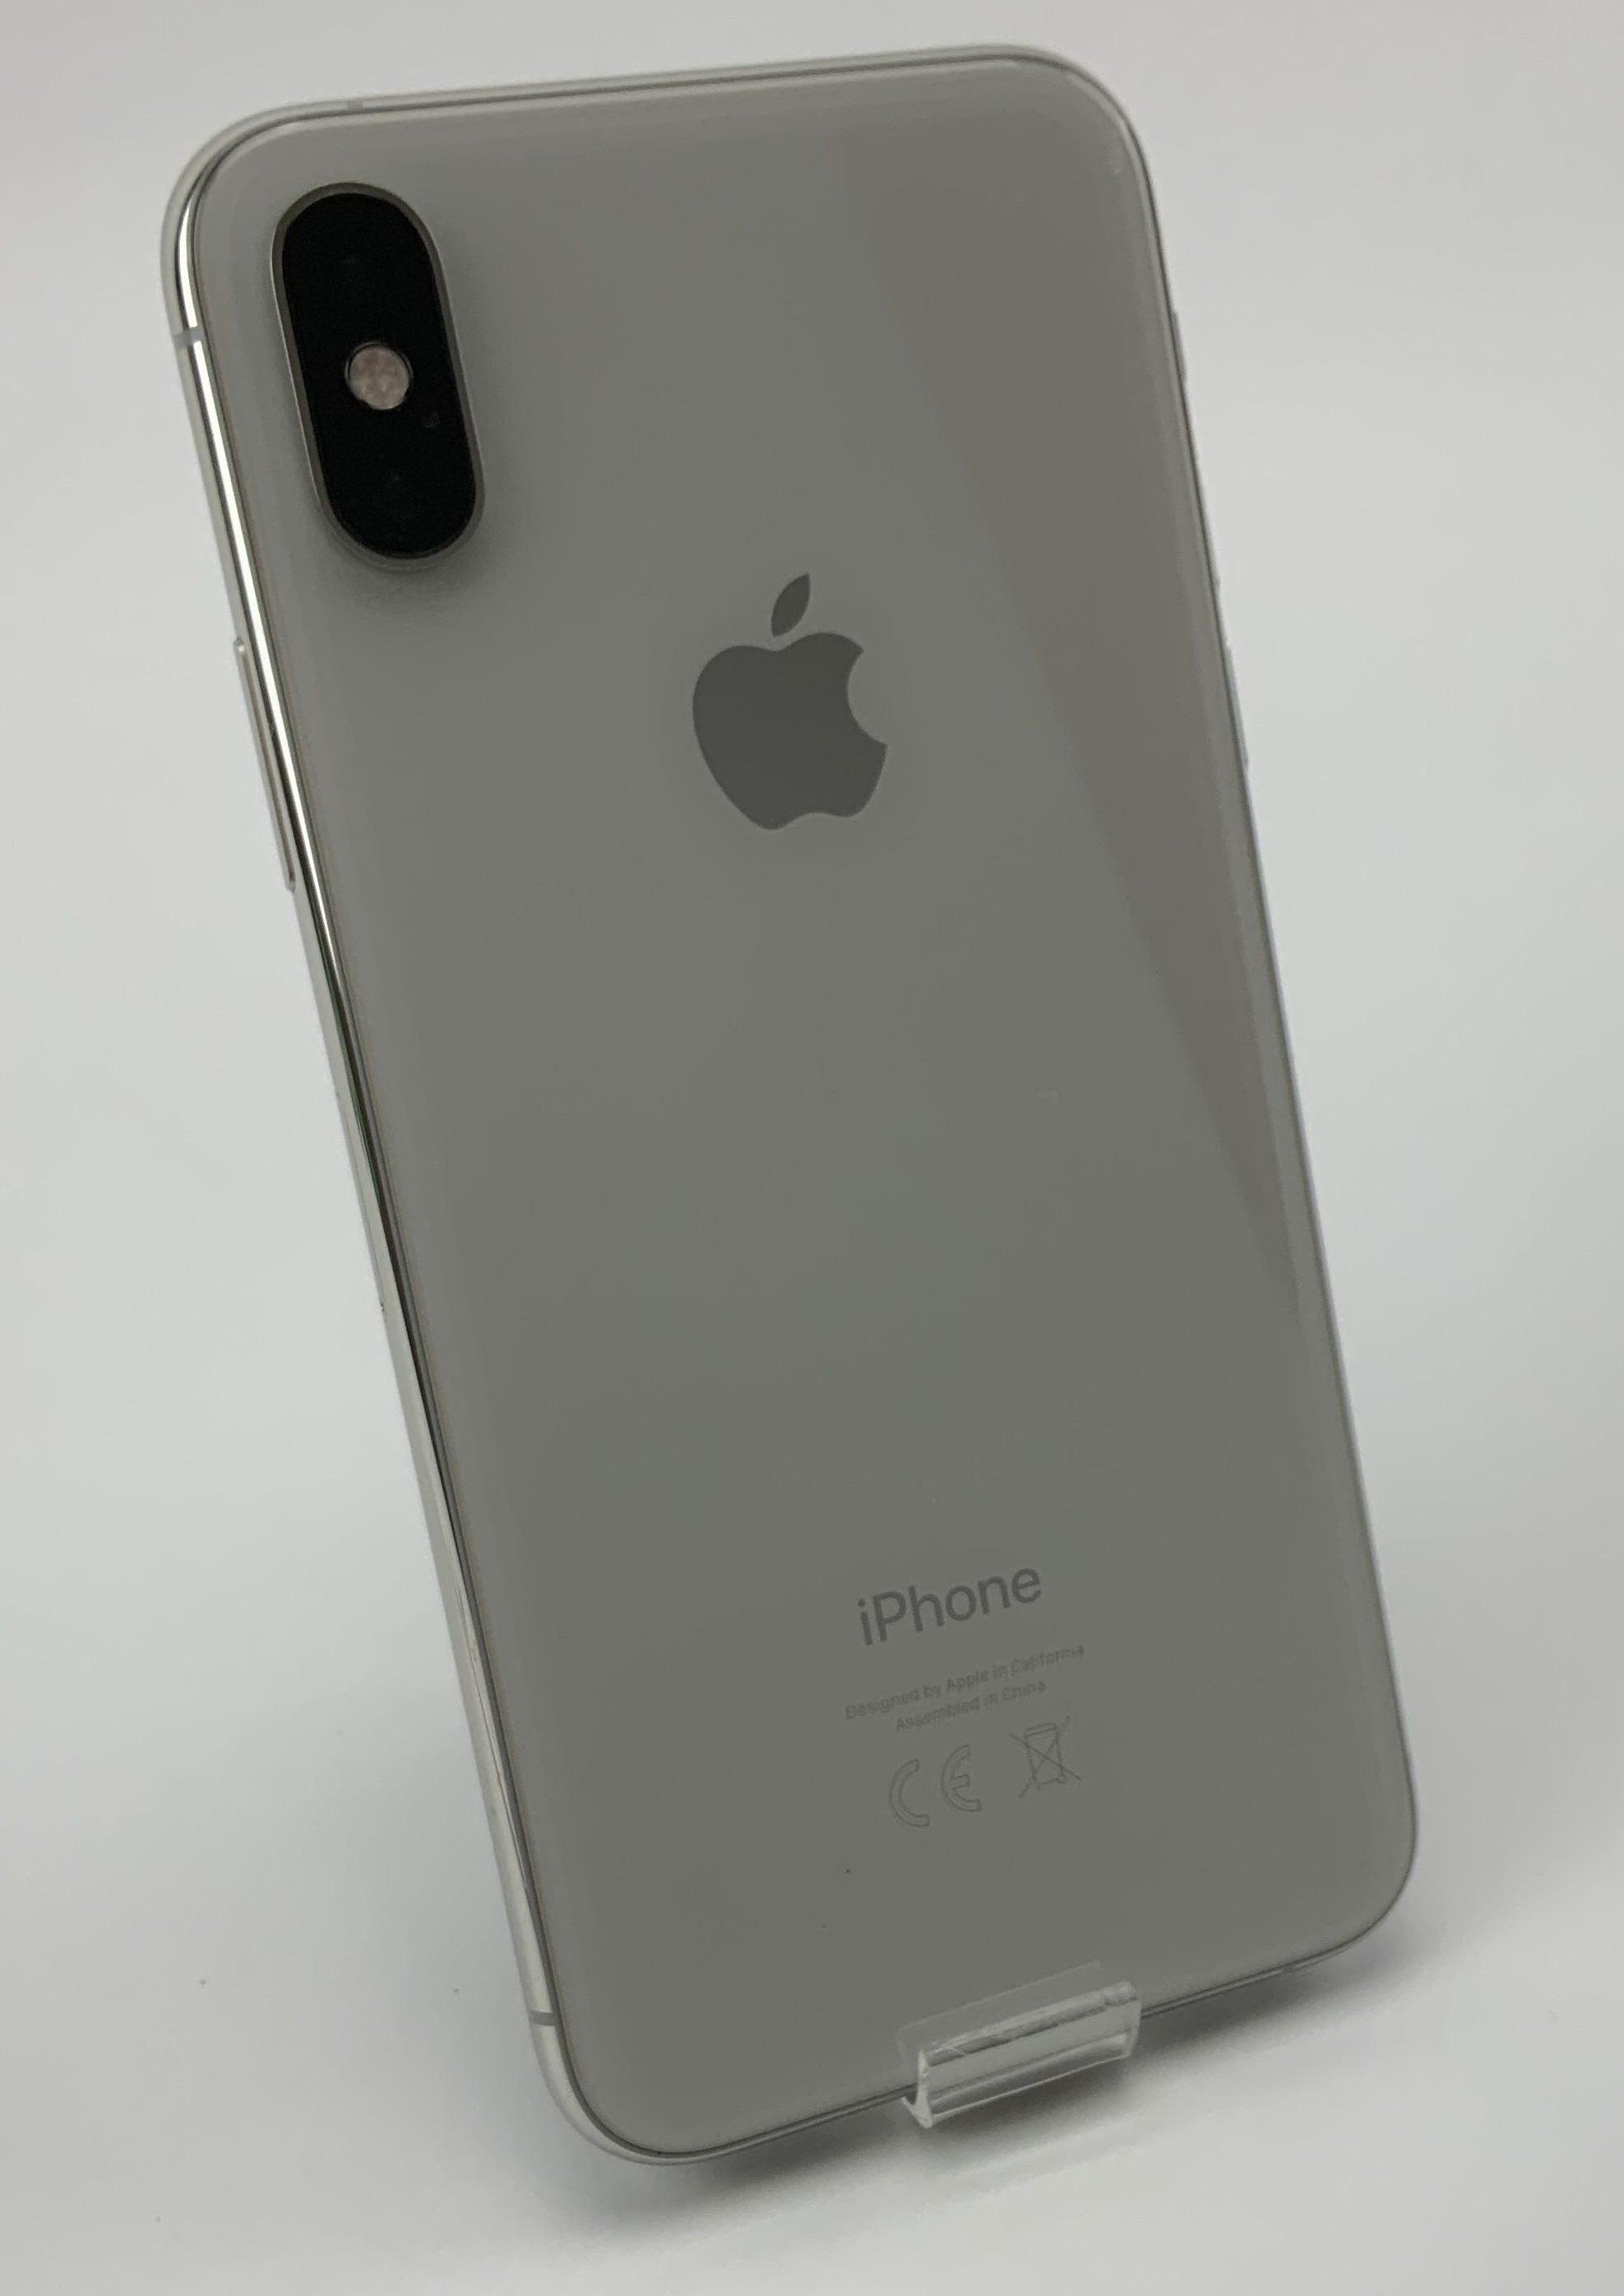 iPhone XS 64GB, 64GB, Silver, immagine 2